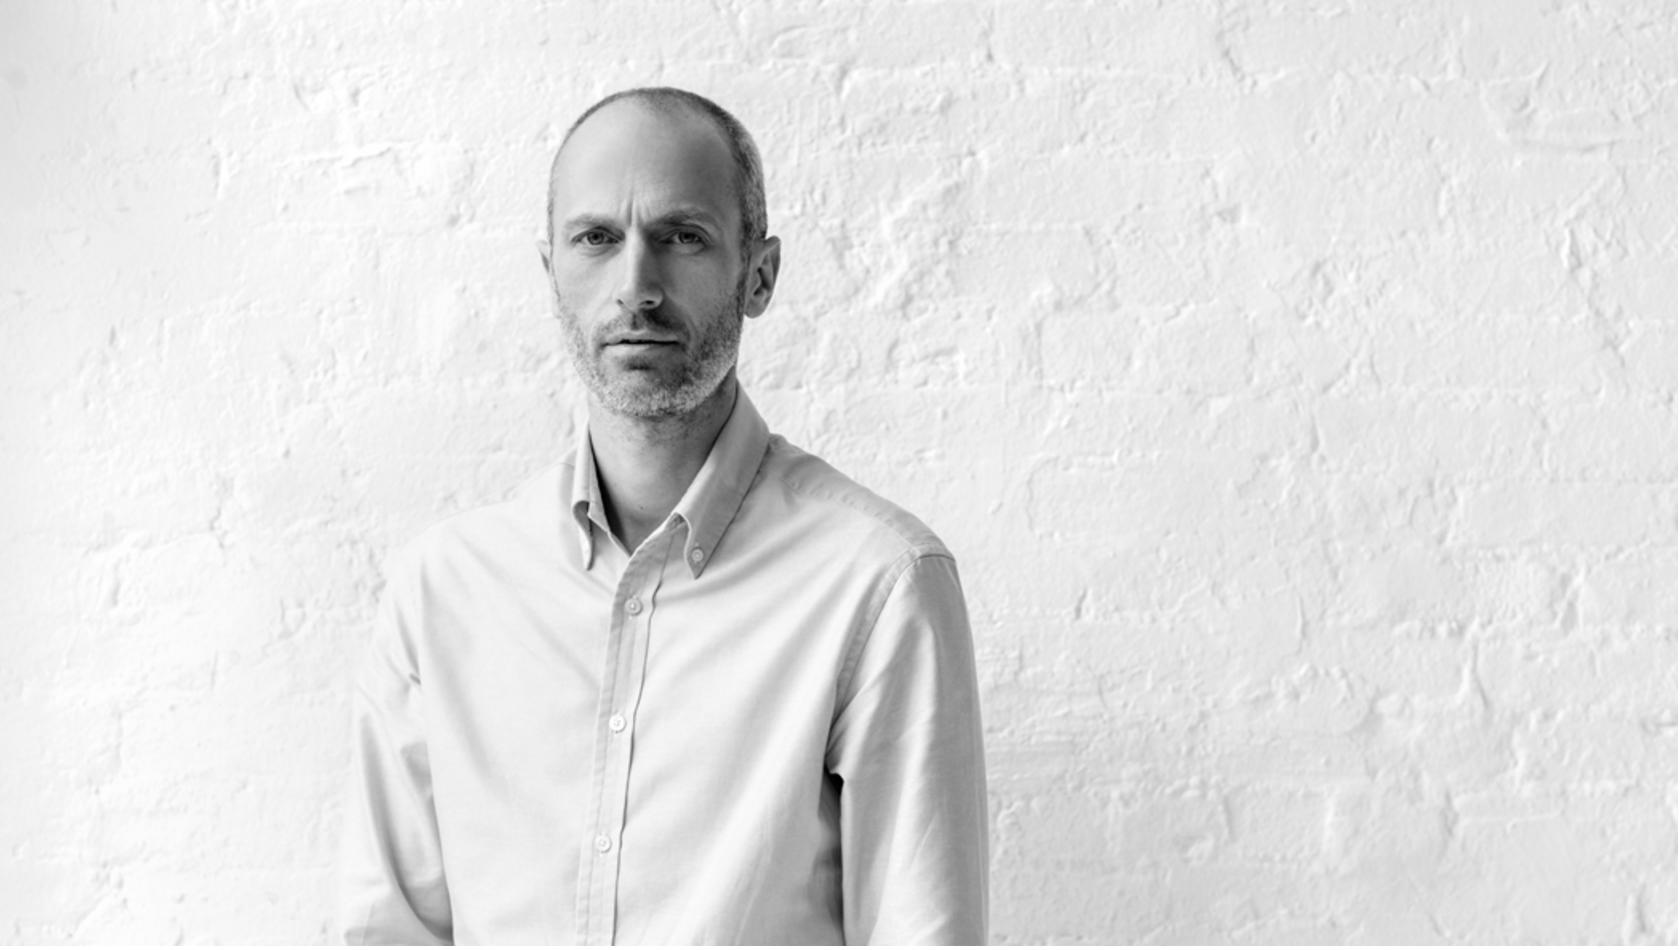 AERA STYLE MAGAZINE, 08.30.2017  Interview with Mark Weston, Dunhill   クラシックを定義する。ダンヒル